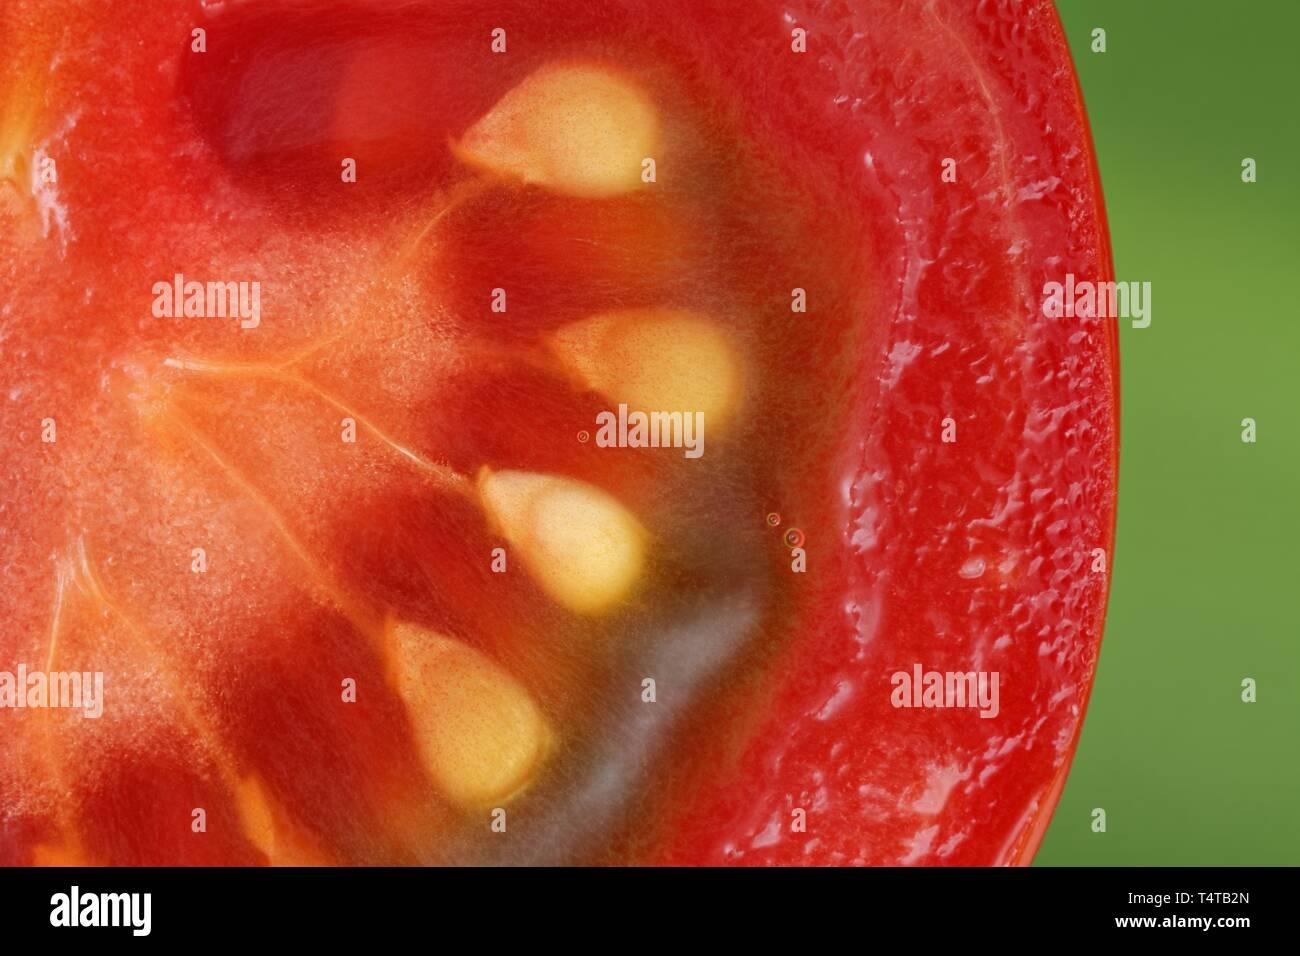 Closeup of a sliced tomato (Solanum lycopersicum) - Stock Image